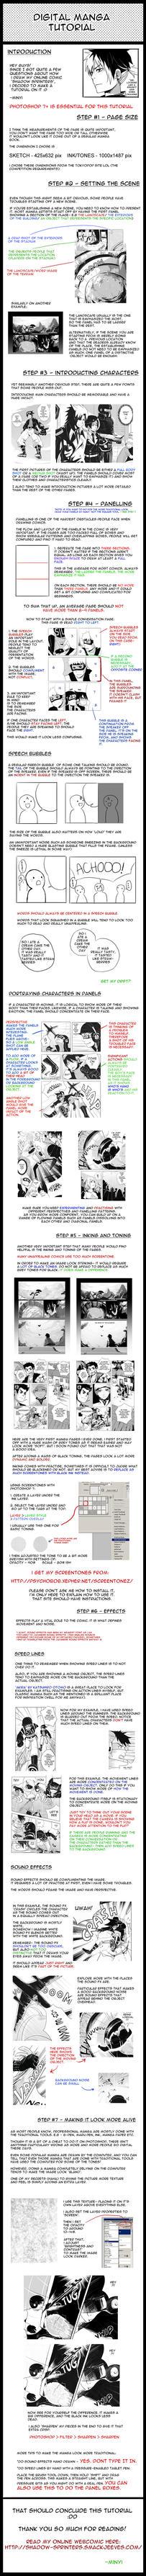 Digital Manga Tutorial by Minyi